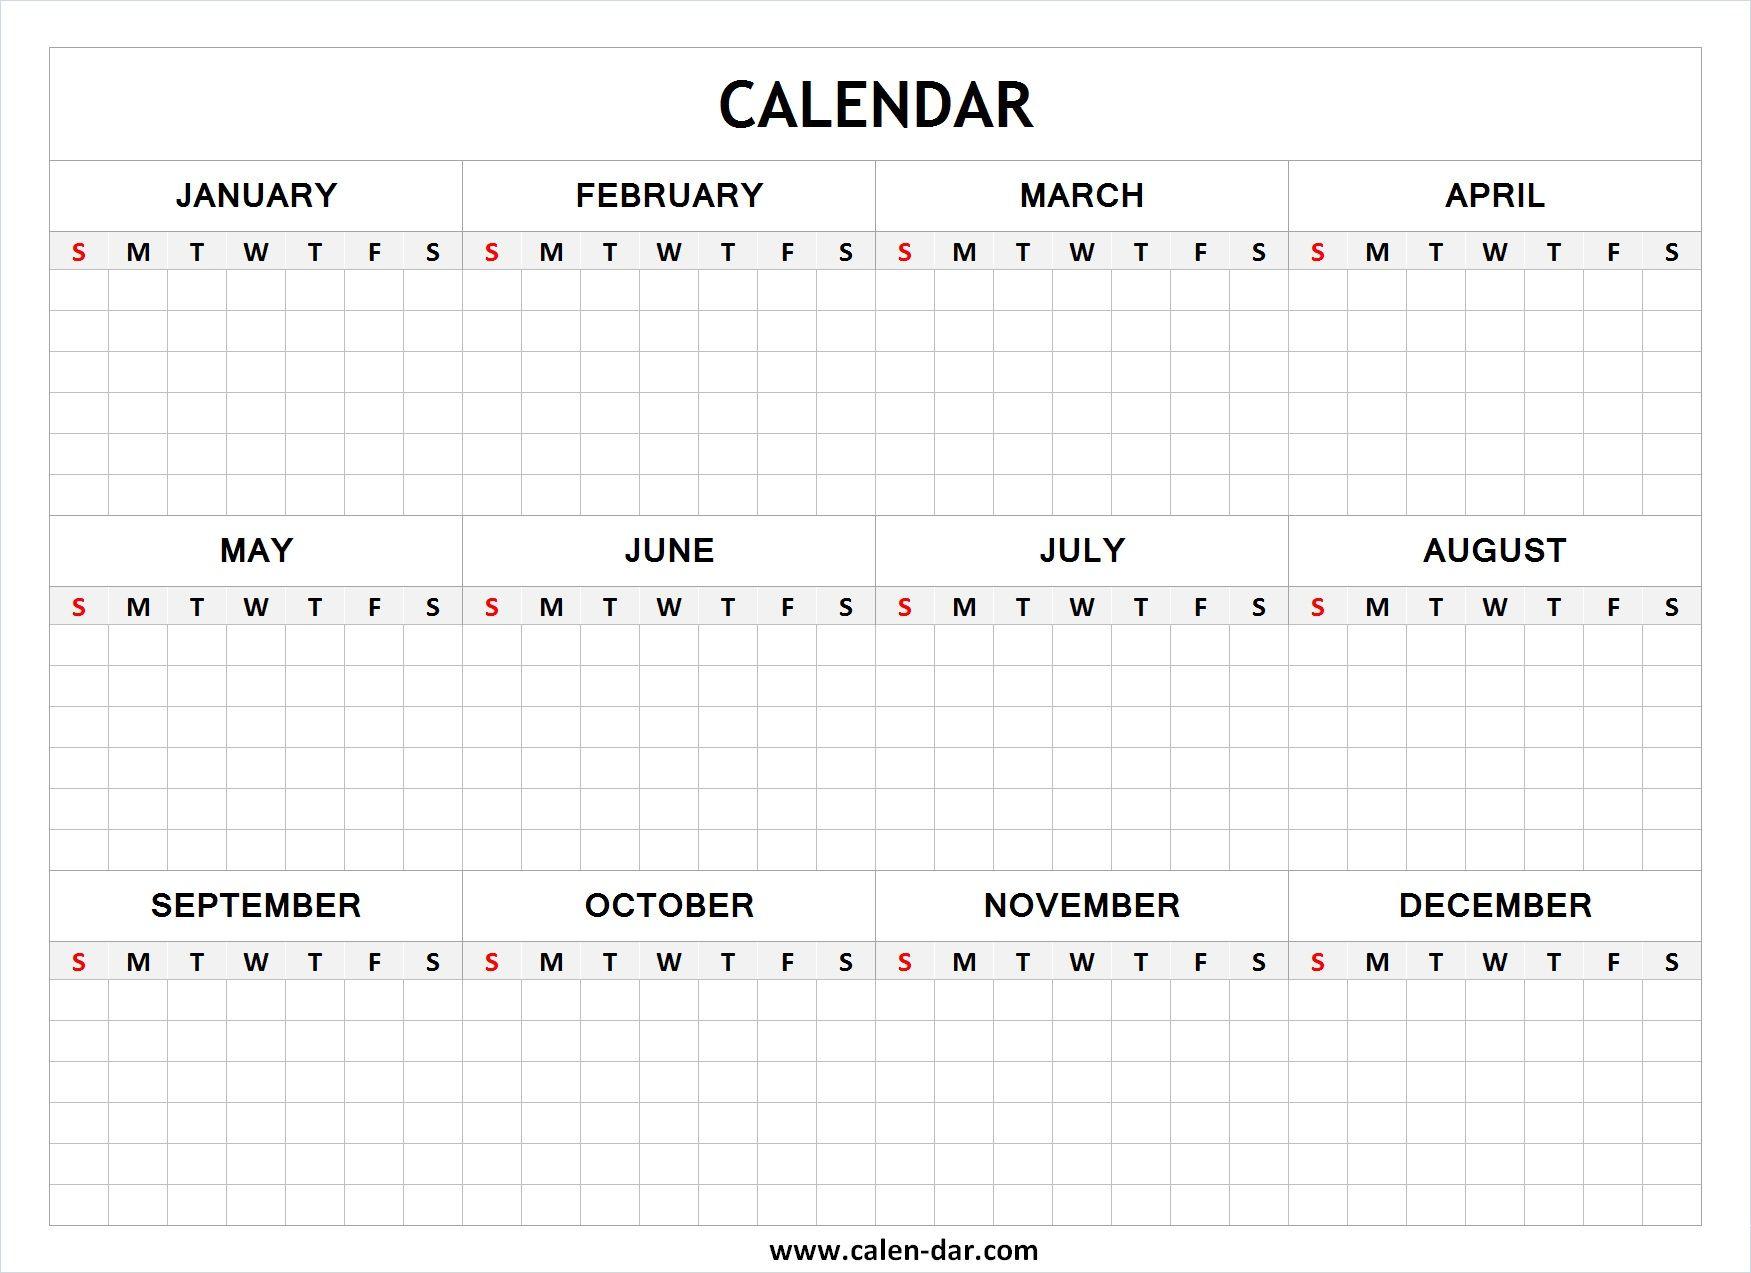 Blank Year Calendar | Printable Yearly Calendar, Yearly within Printable Yearly Calendar With Boxes